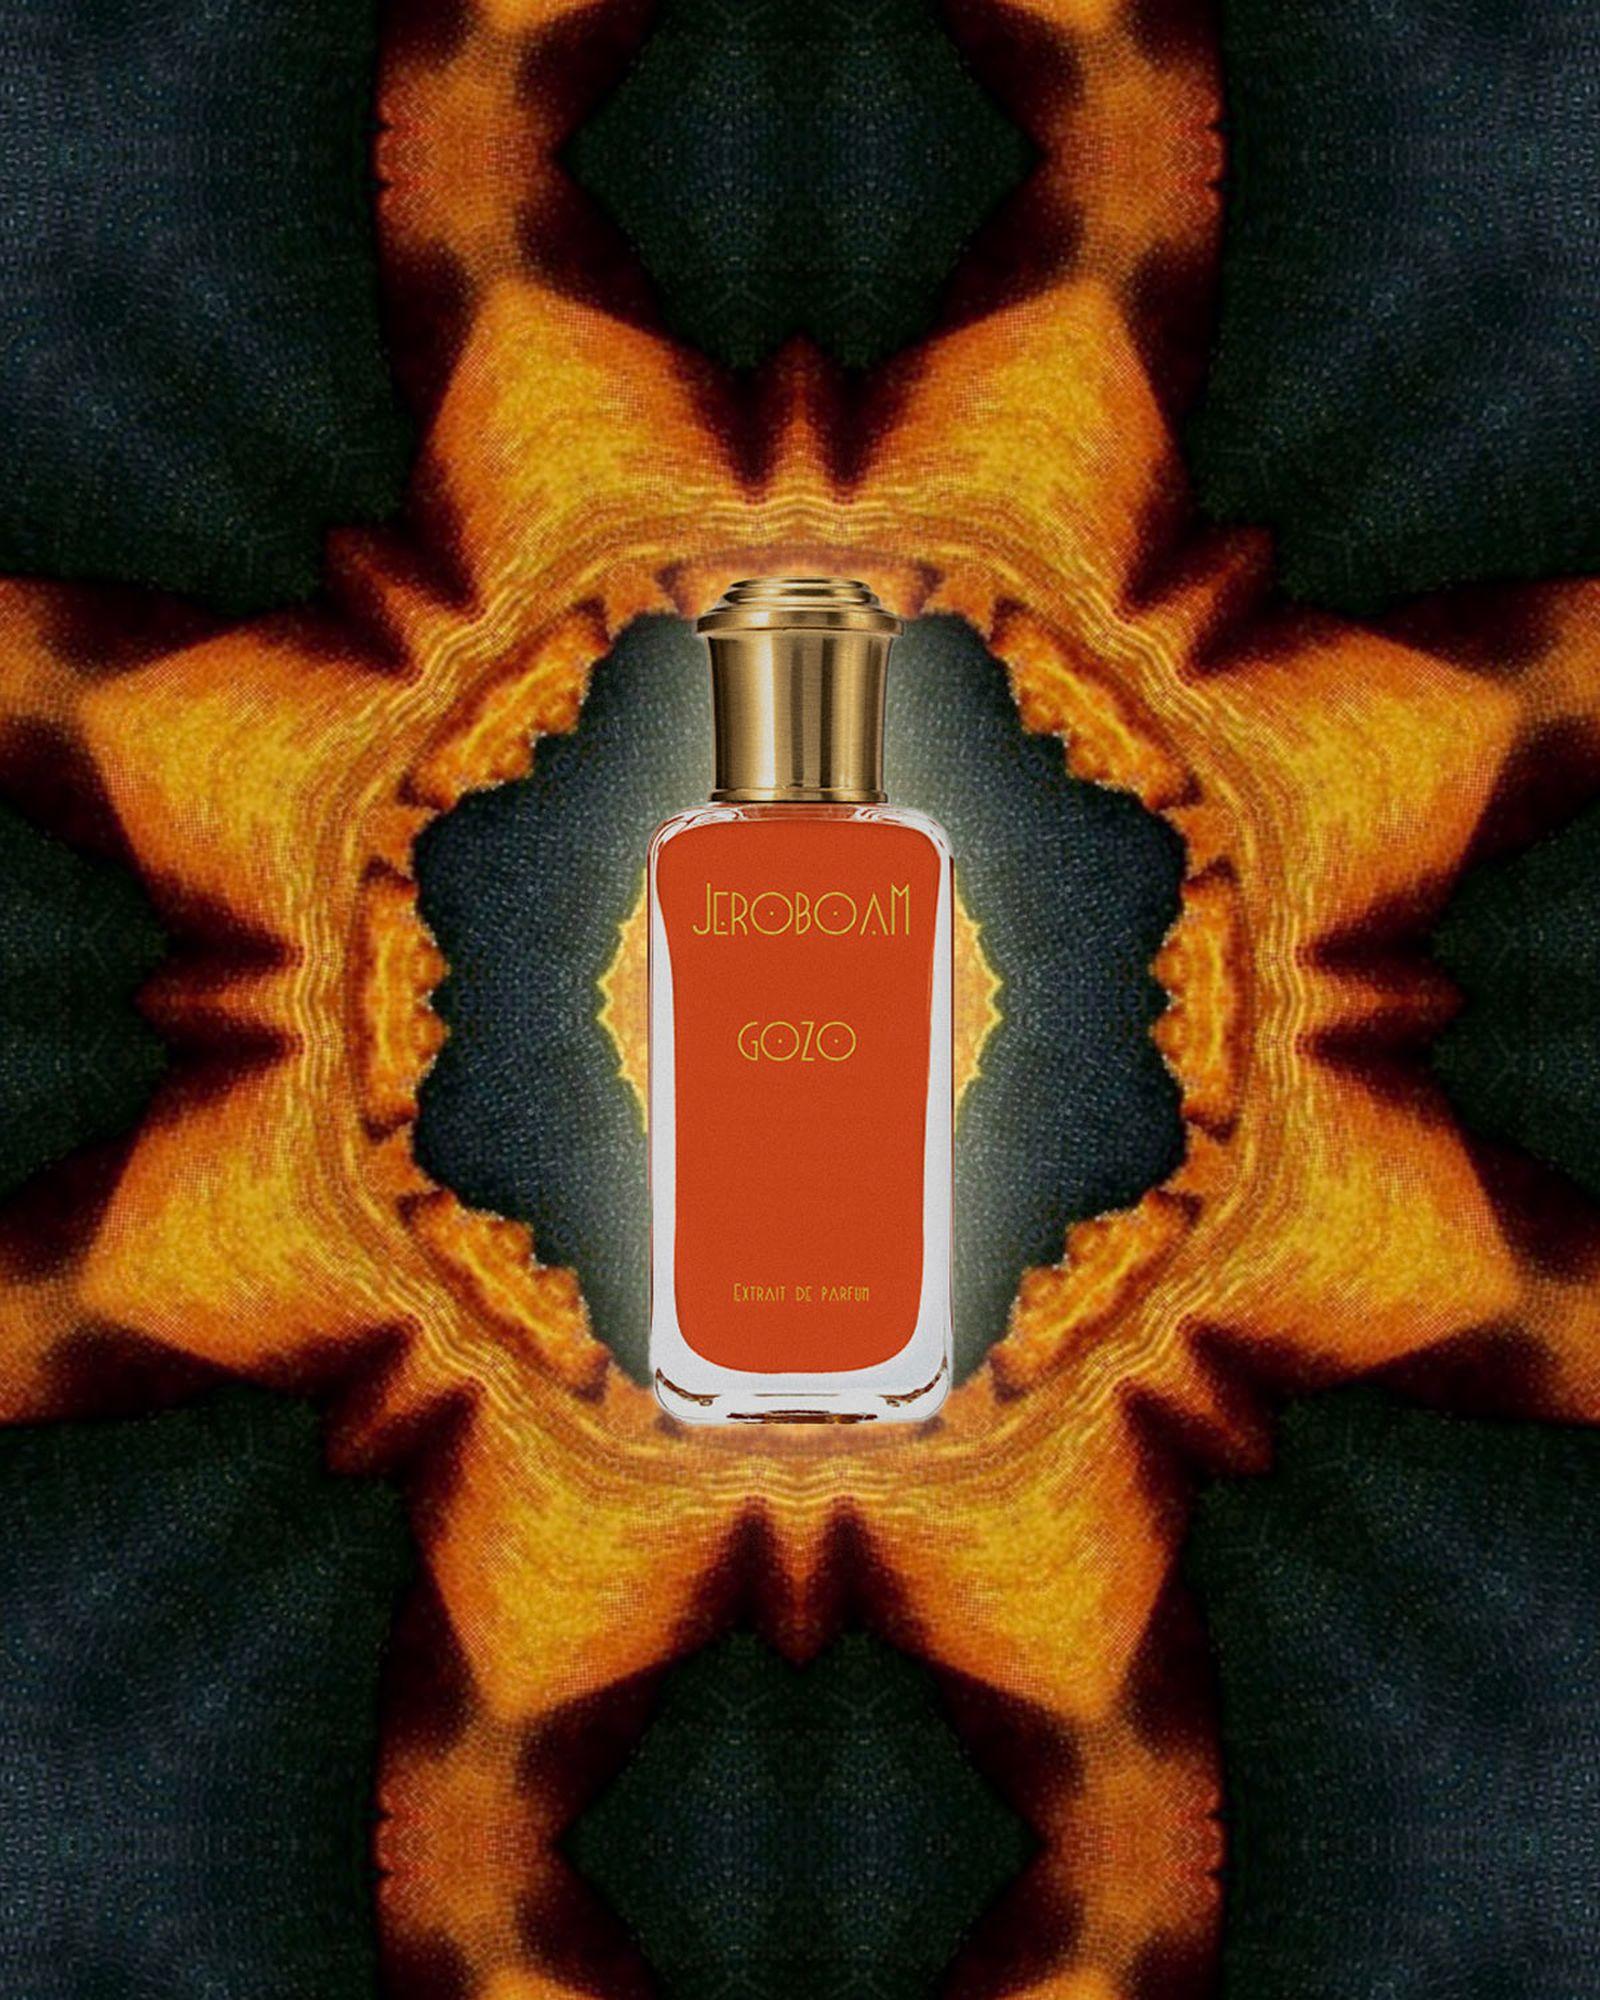 200825_ED_SER_TheMaterialist_Perfume_Amber_Gozo_1200x1500